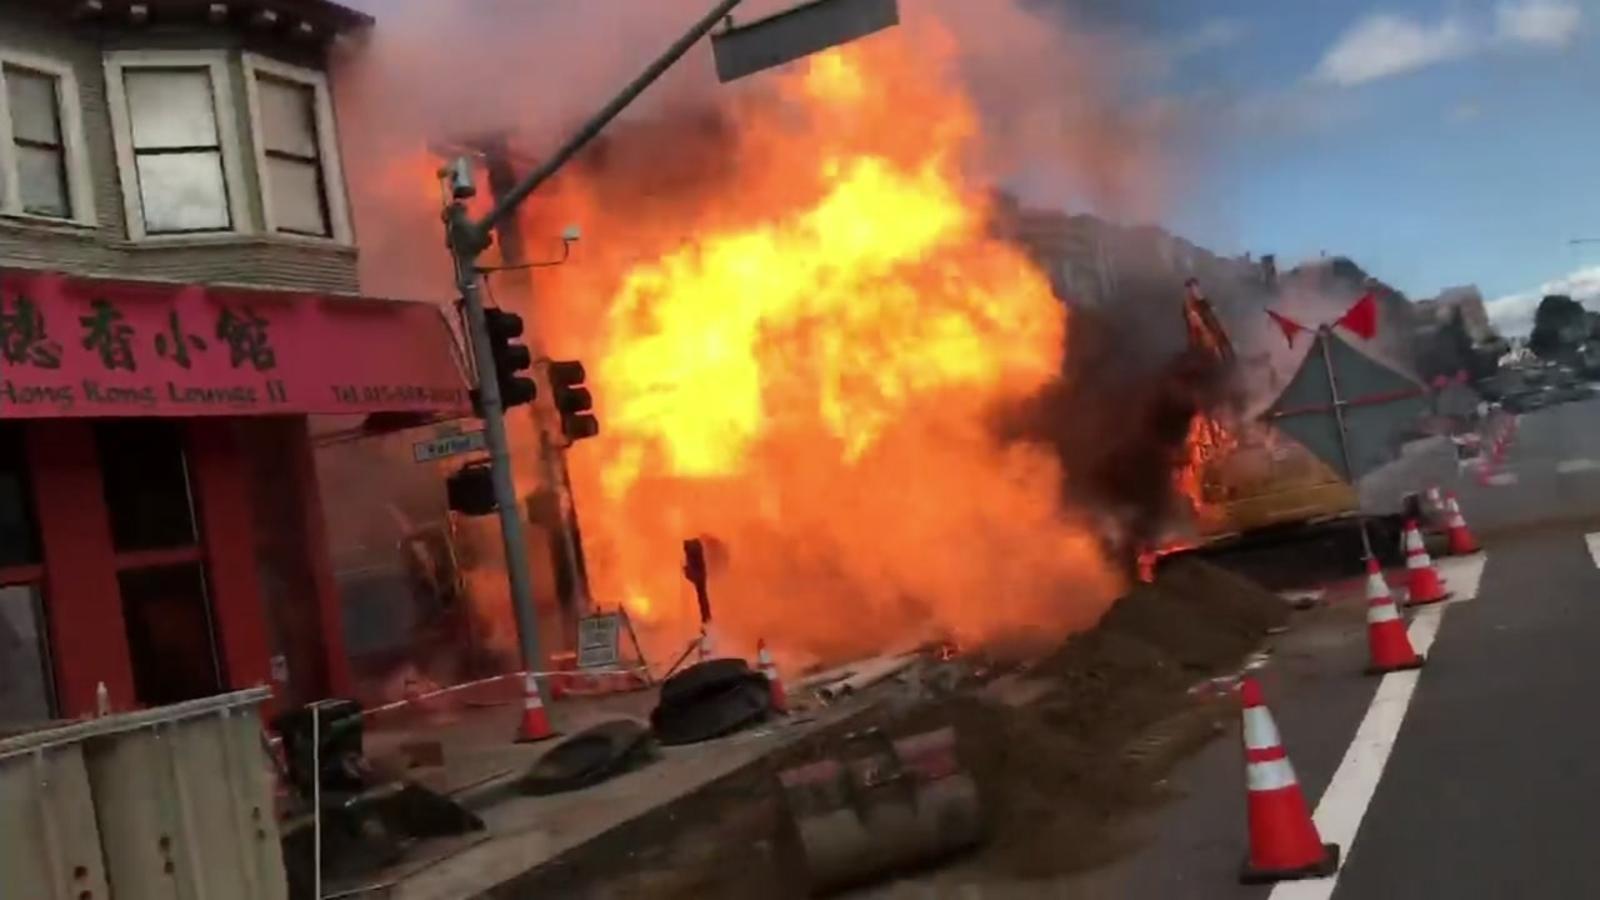 KADUNA gas explosion: El-Rufai shuts retail shops